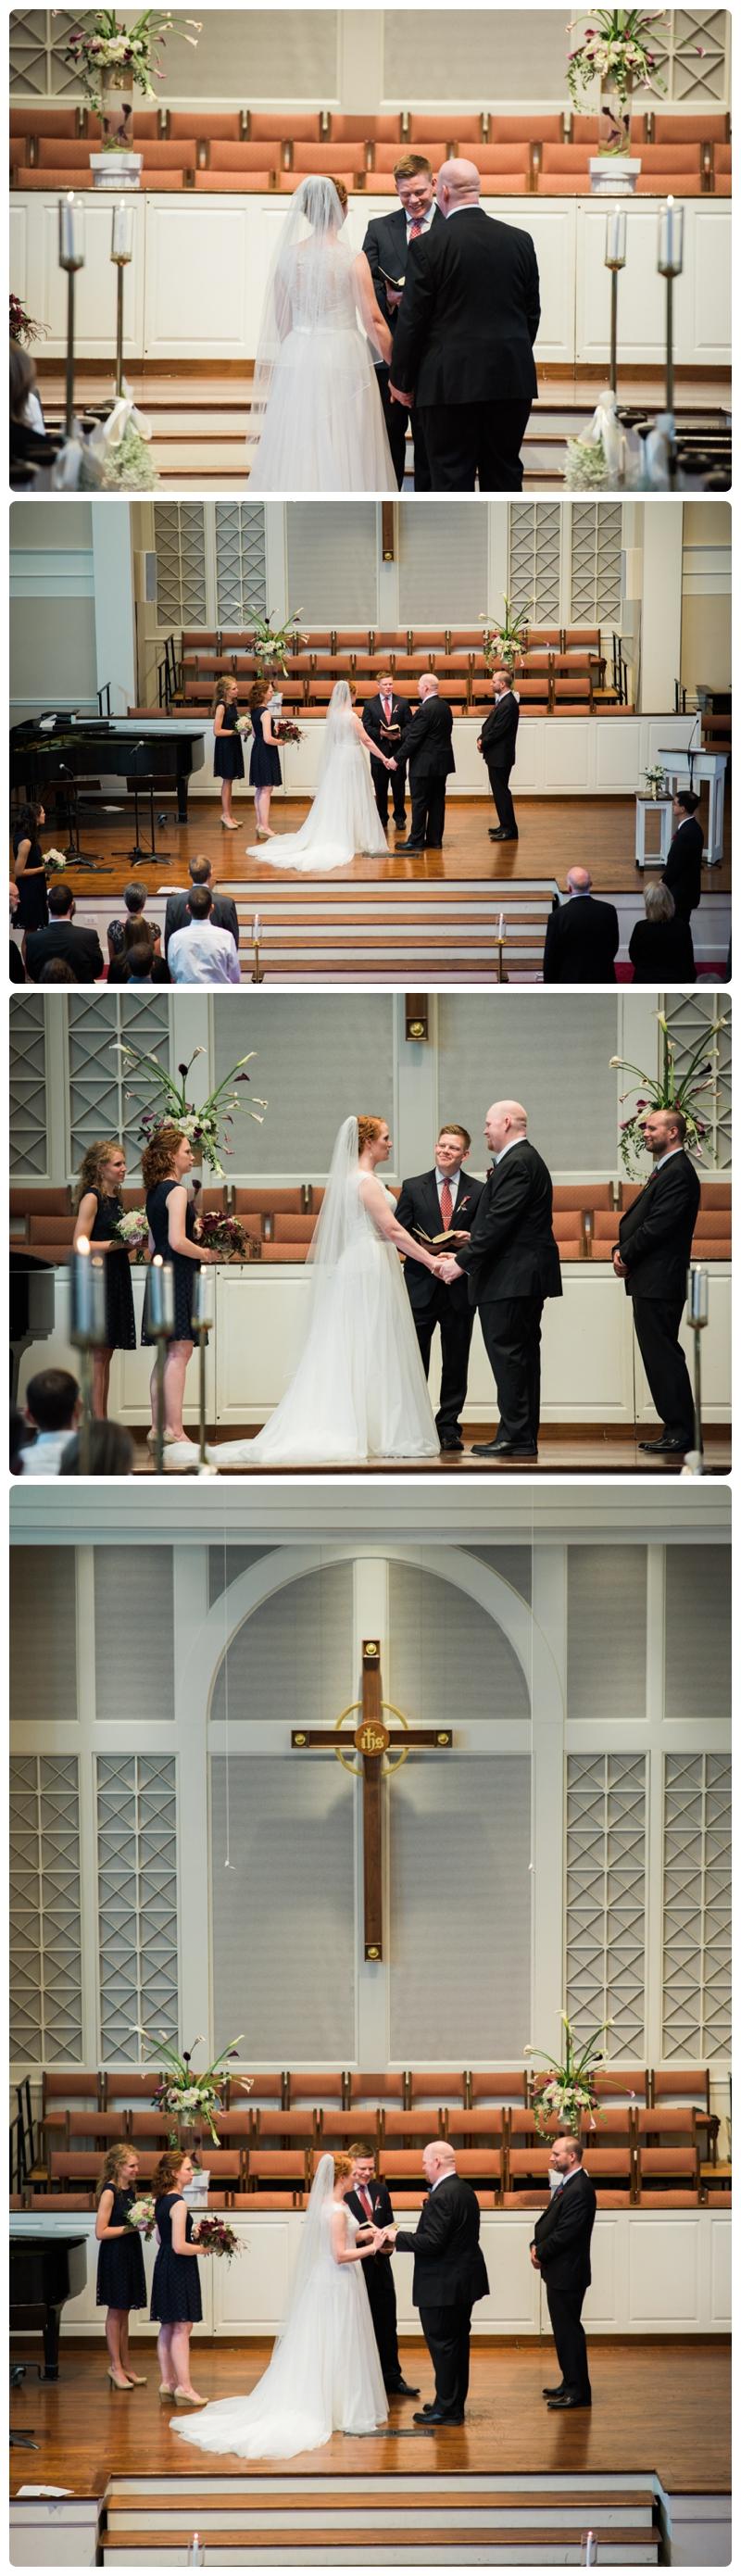 Wedding in Falls Church Virginia by Rachael Foster Photography_0018.jpg